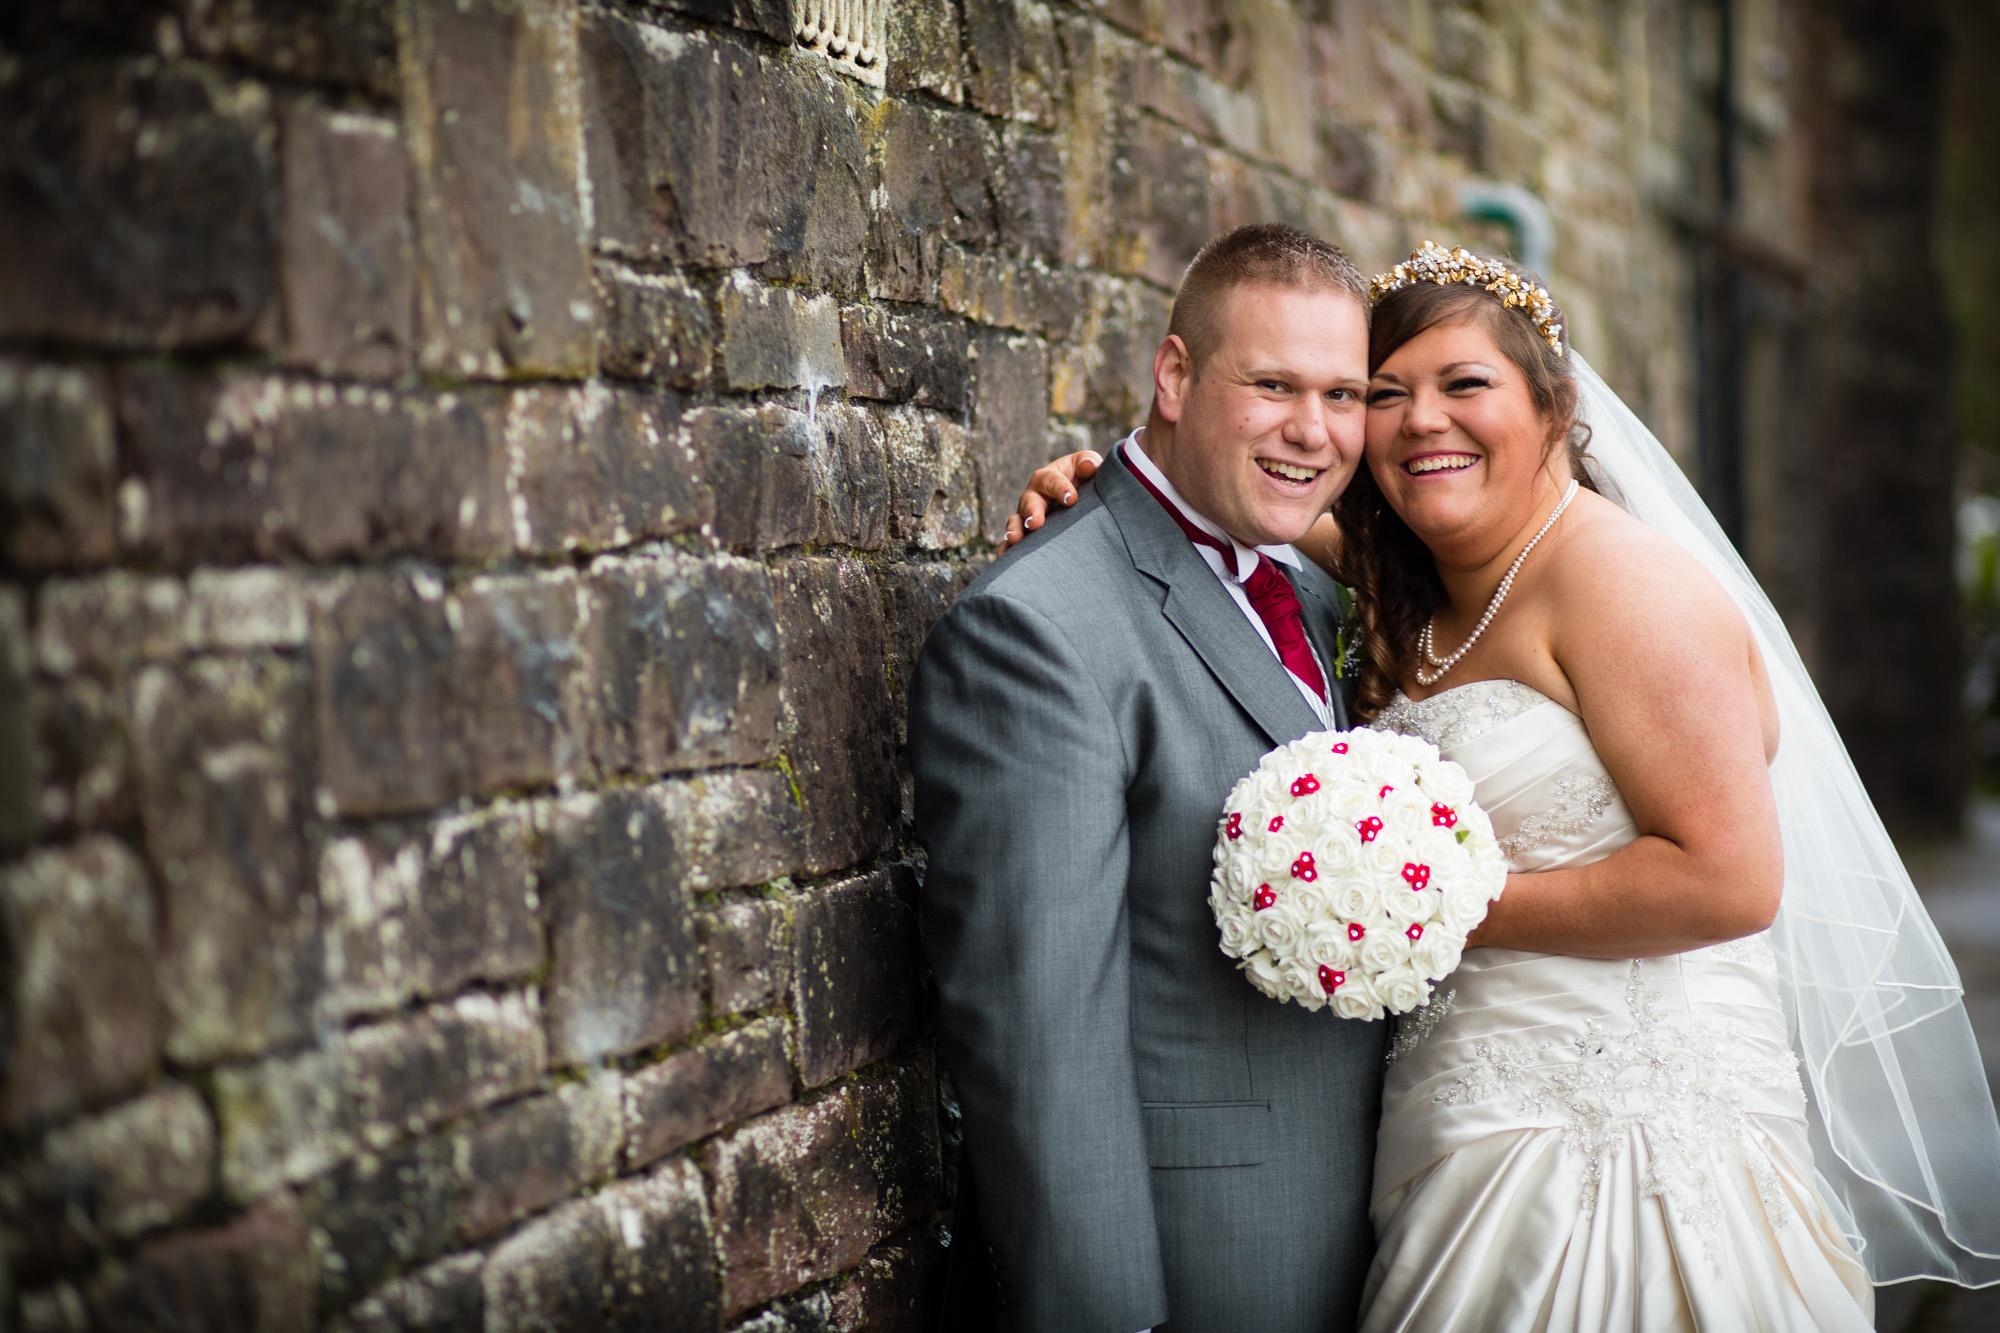 South Wales Wedding Photograher at Craig Y Nos Castle (28)